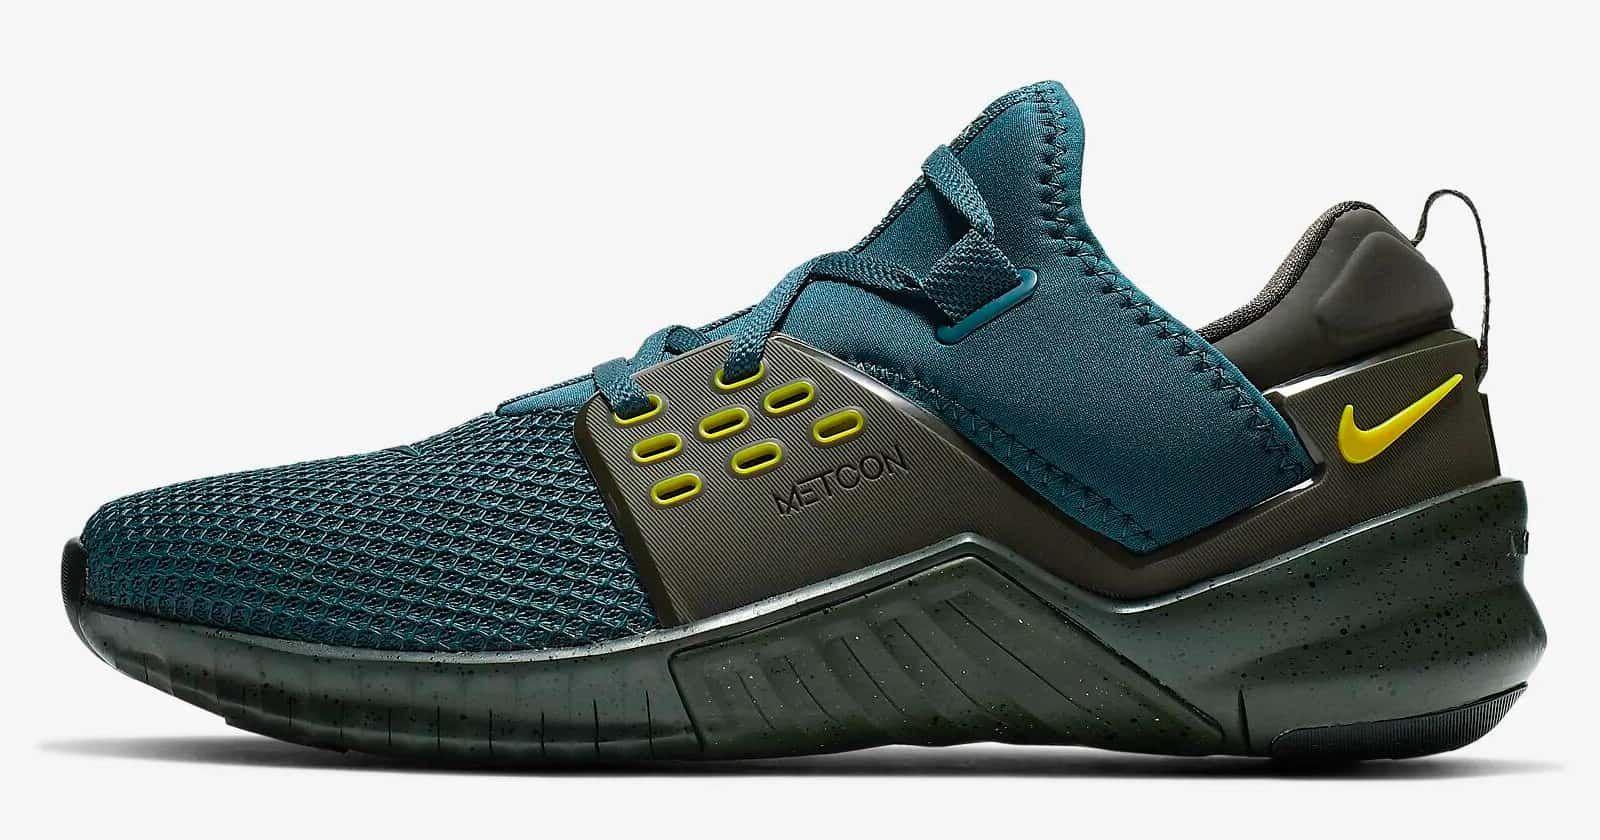 Nike Metcon Running Shoe